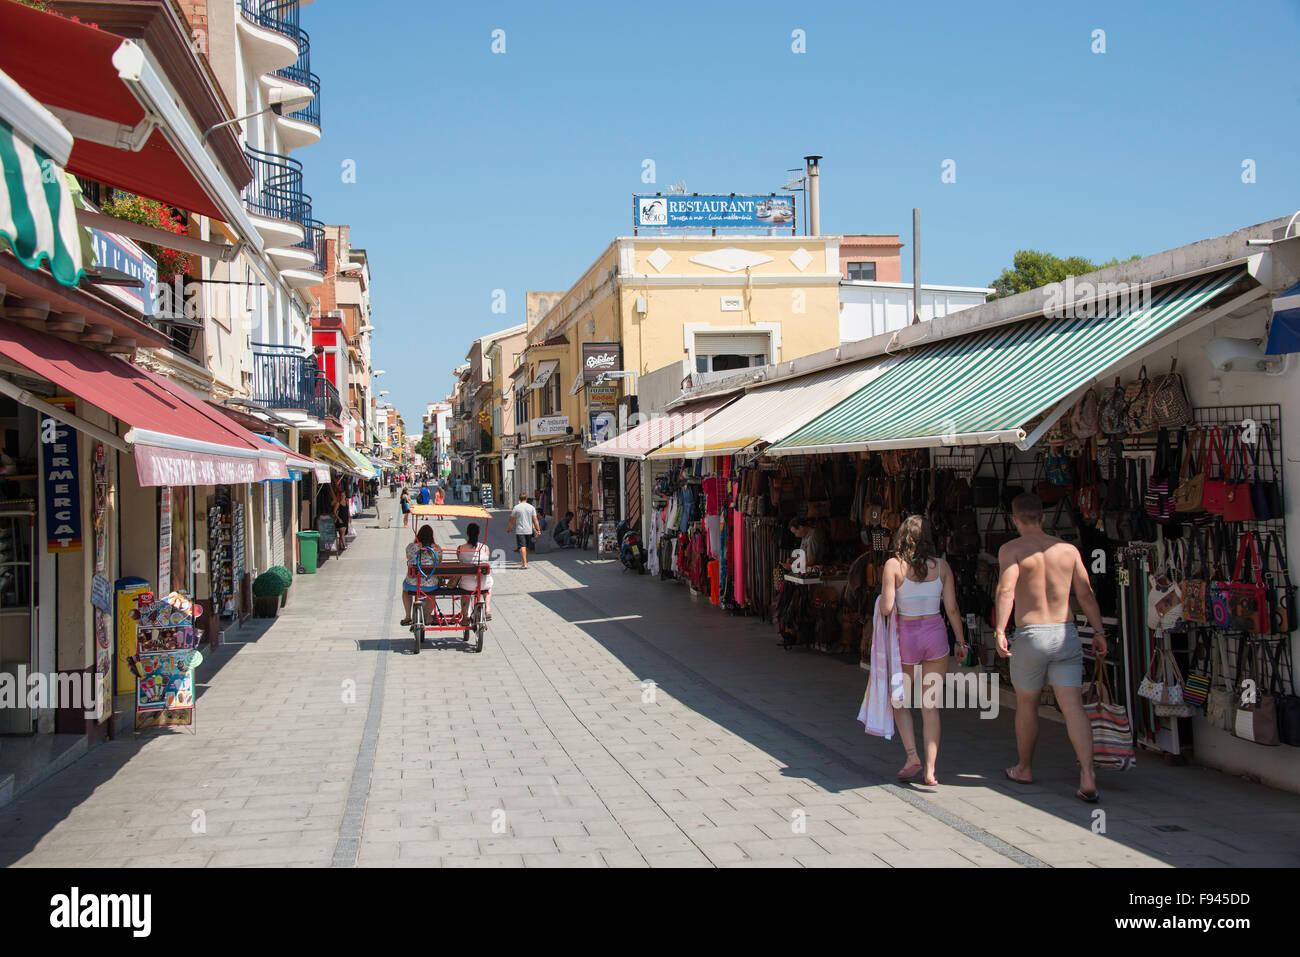 Souvenir Shops, Carrer de Sant Esteve, Malgrat de Mar, Costa del Maresme, Provinz Barcelona, Katalonien, Spanien Stockfoto